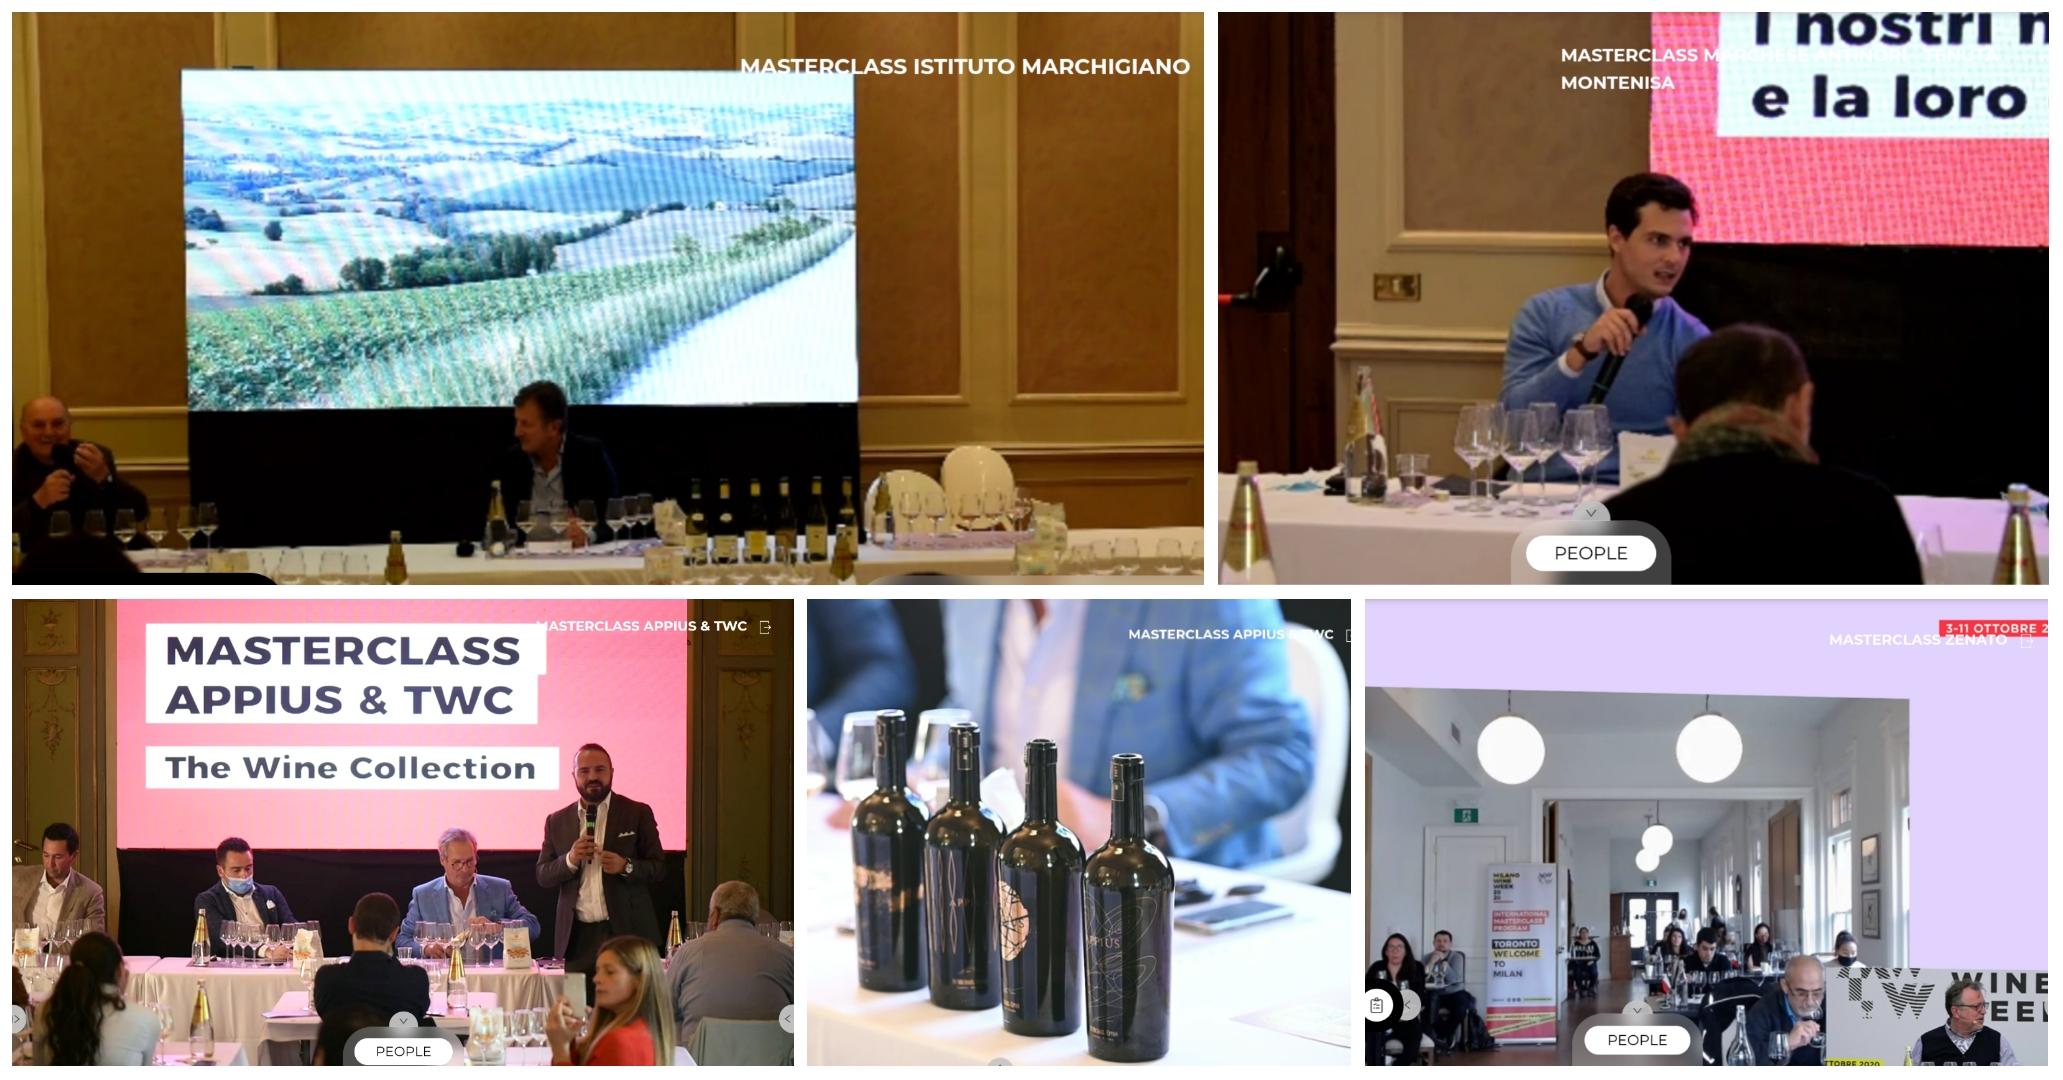 Milano Wine Week 2020 masterclass digital